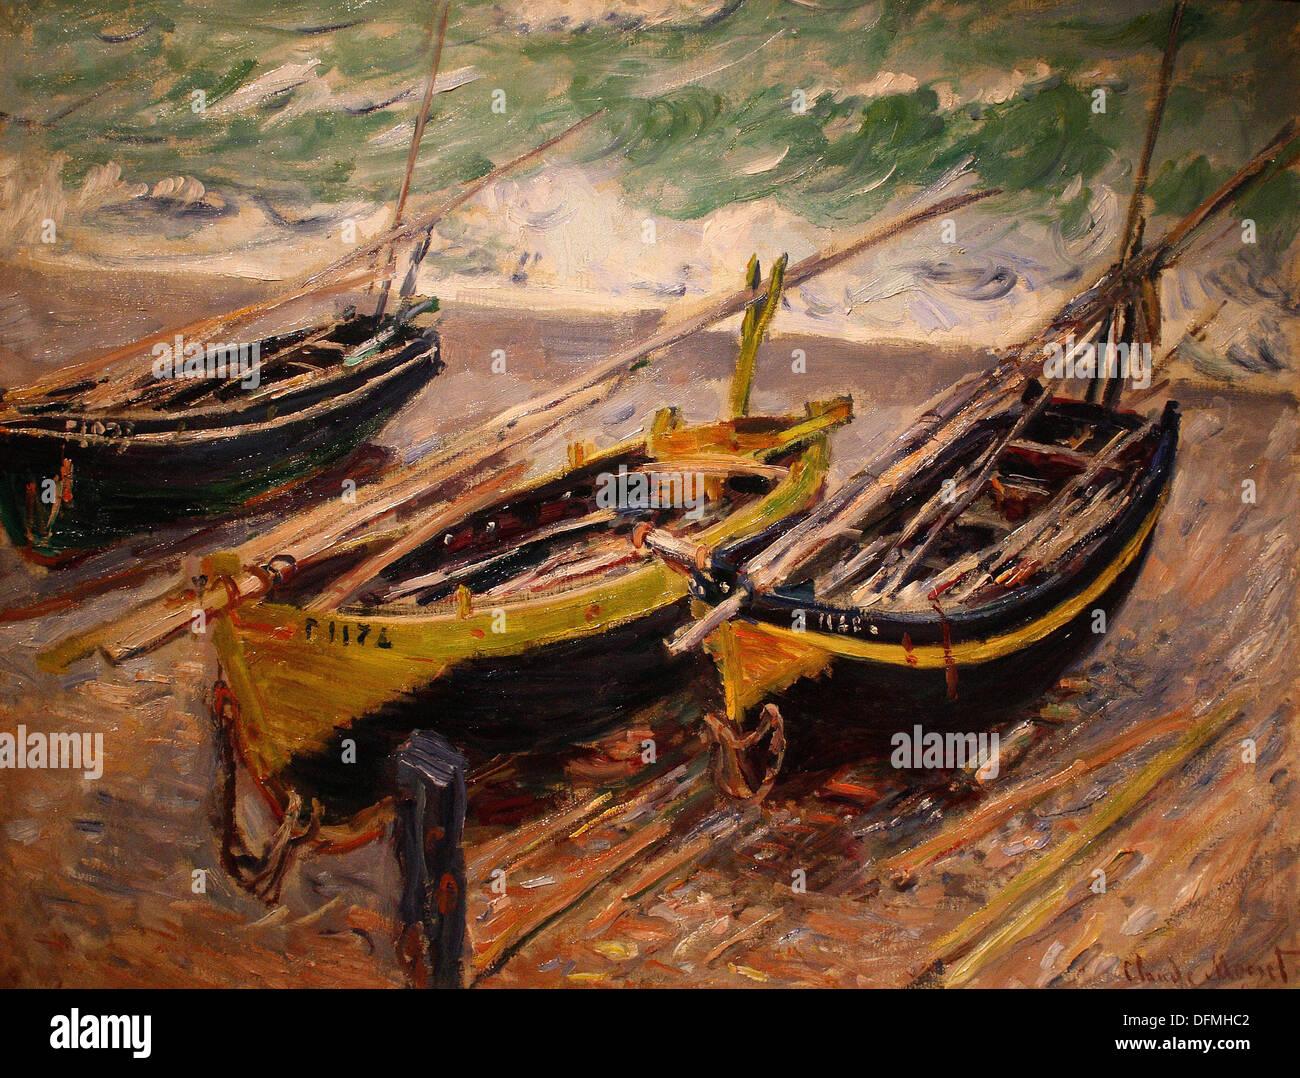 Claude MONET - Three fishing boats - 1886 - Museum of Fine Arts - Budapest, Hungary - Stock Image